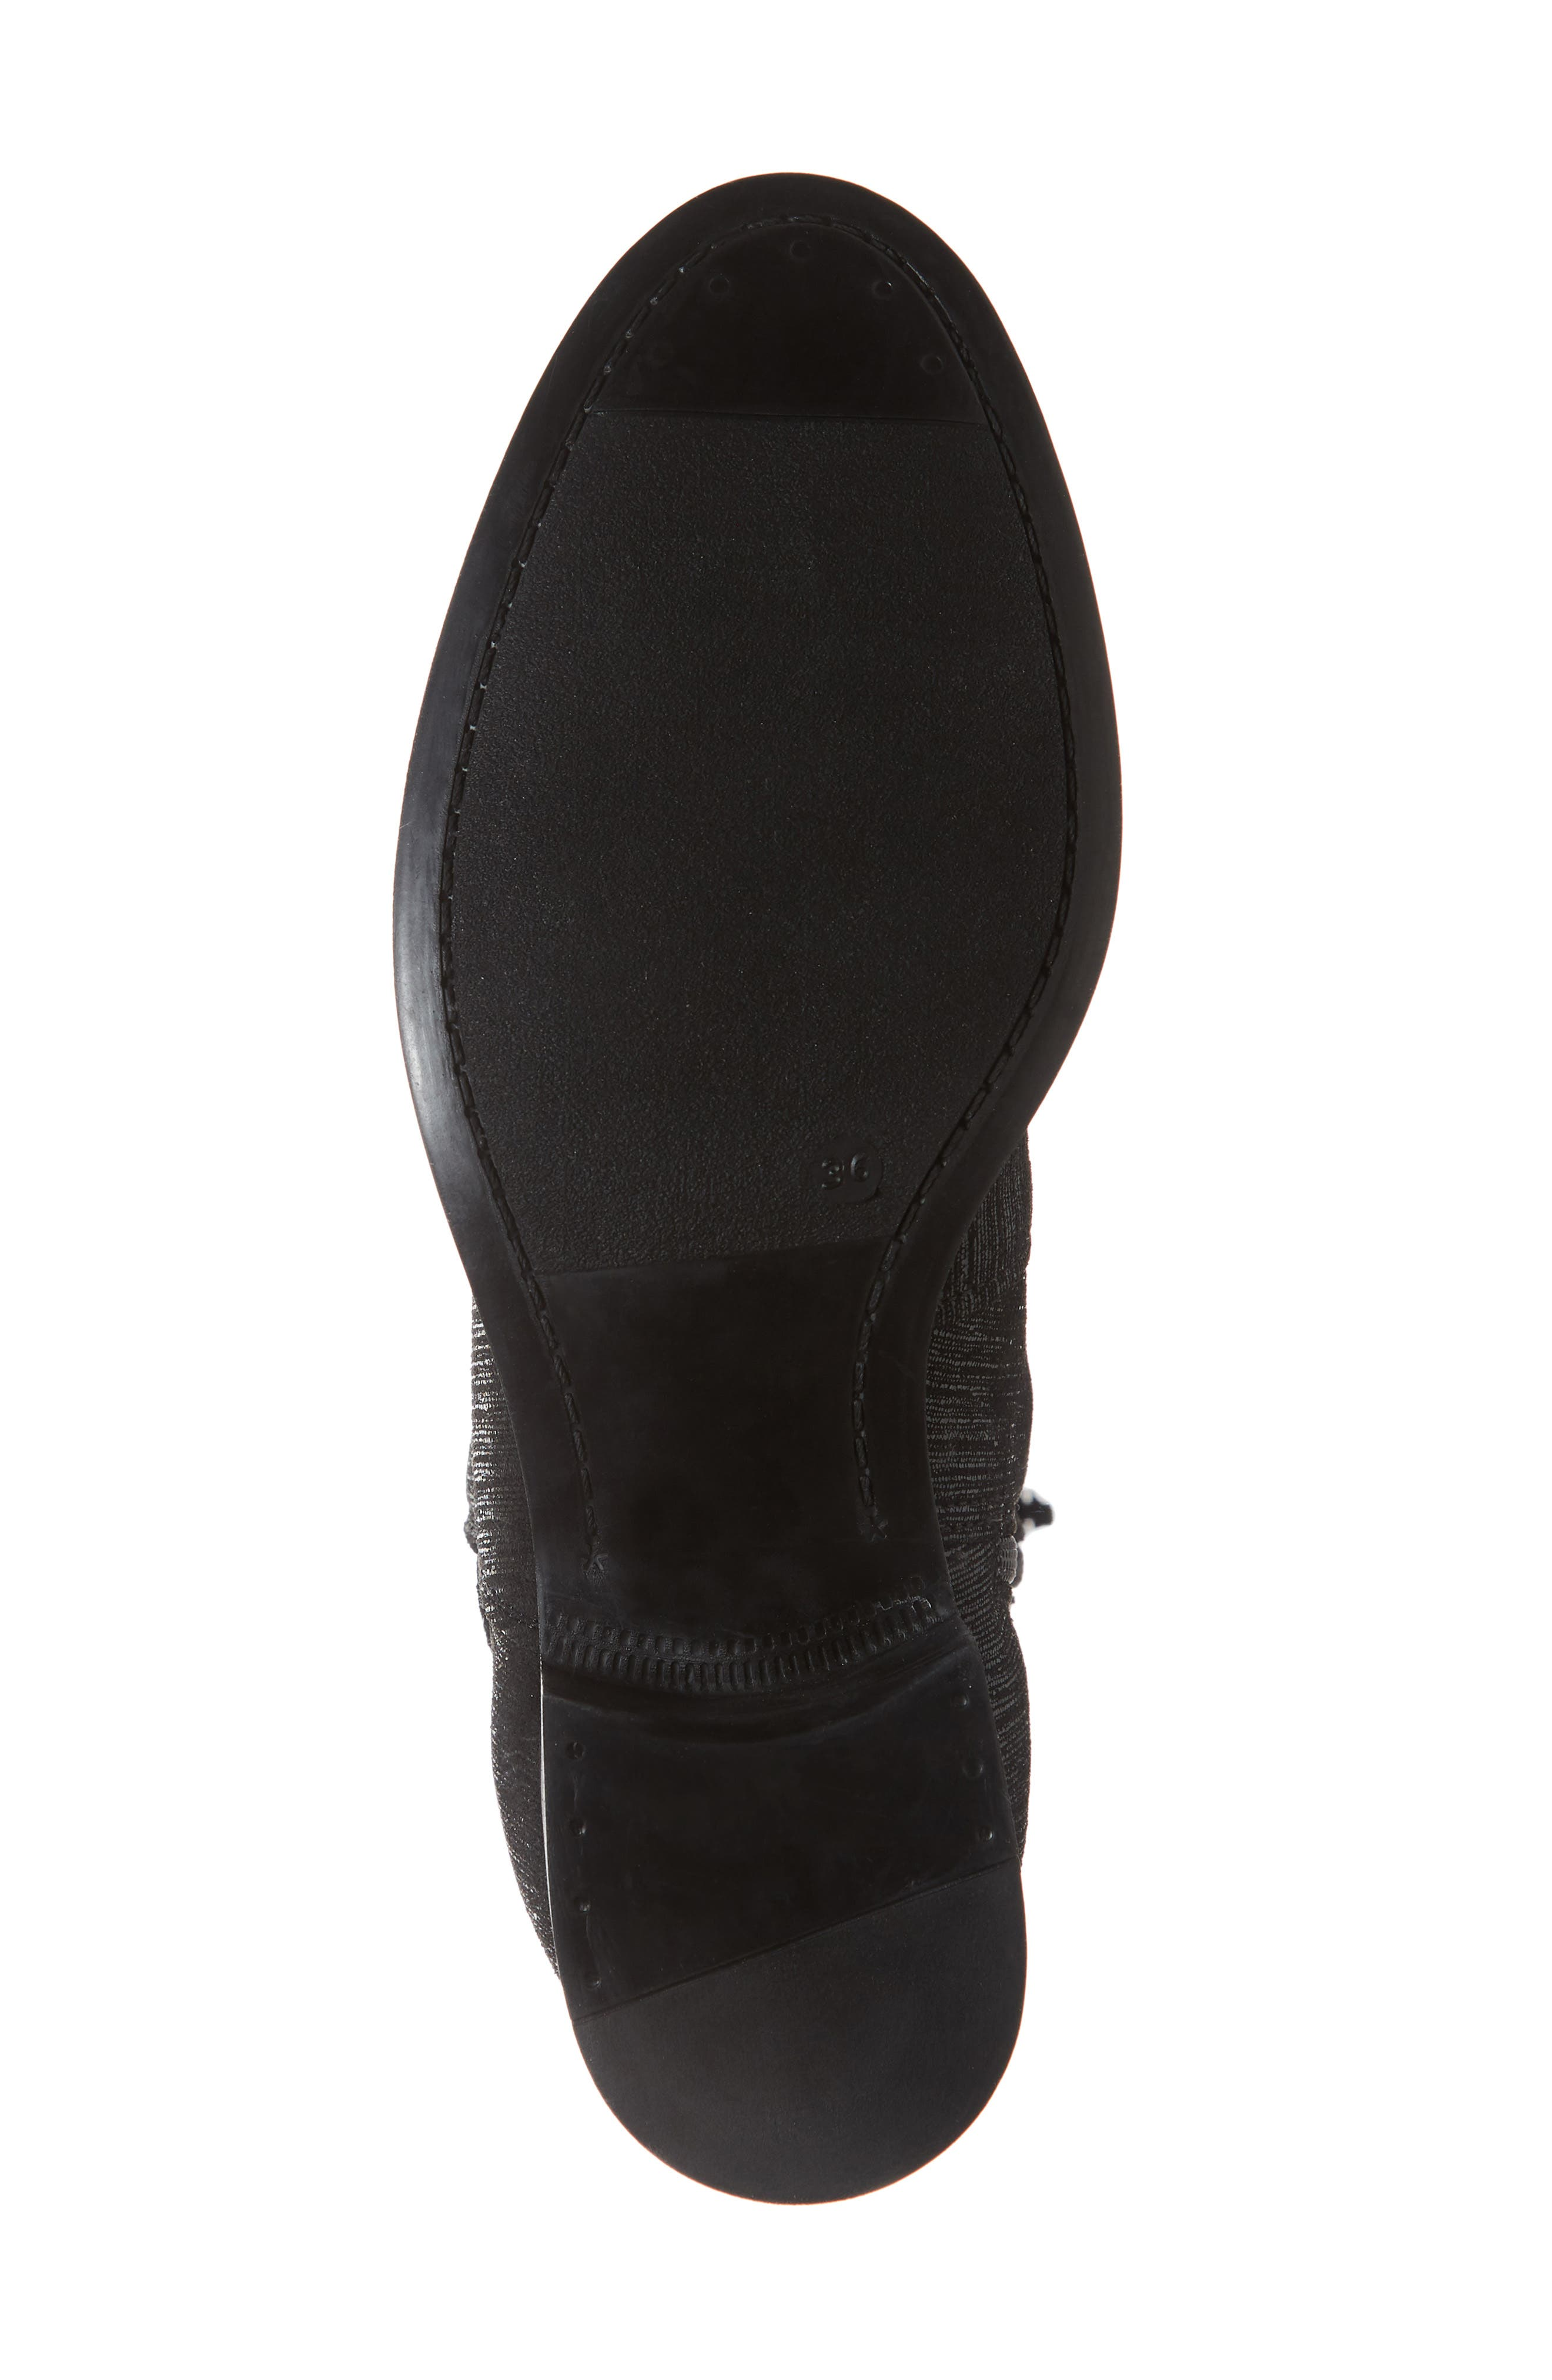 BOS. & CO., Bunt Waterproof Over the Knee Boot, Alternate thumbnail 6, color, BLACK METAL/ LYCRA